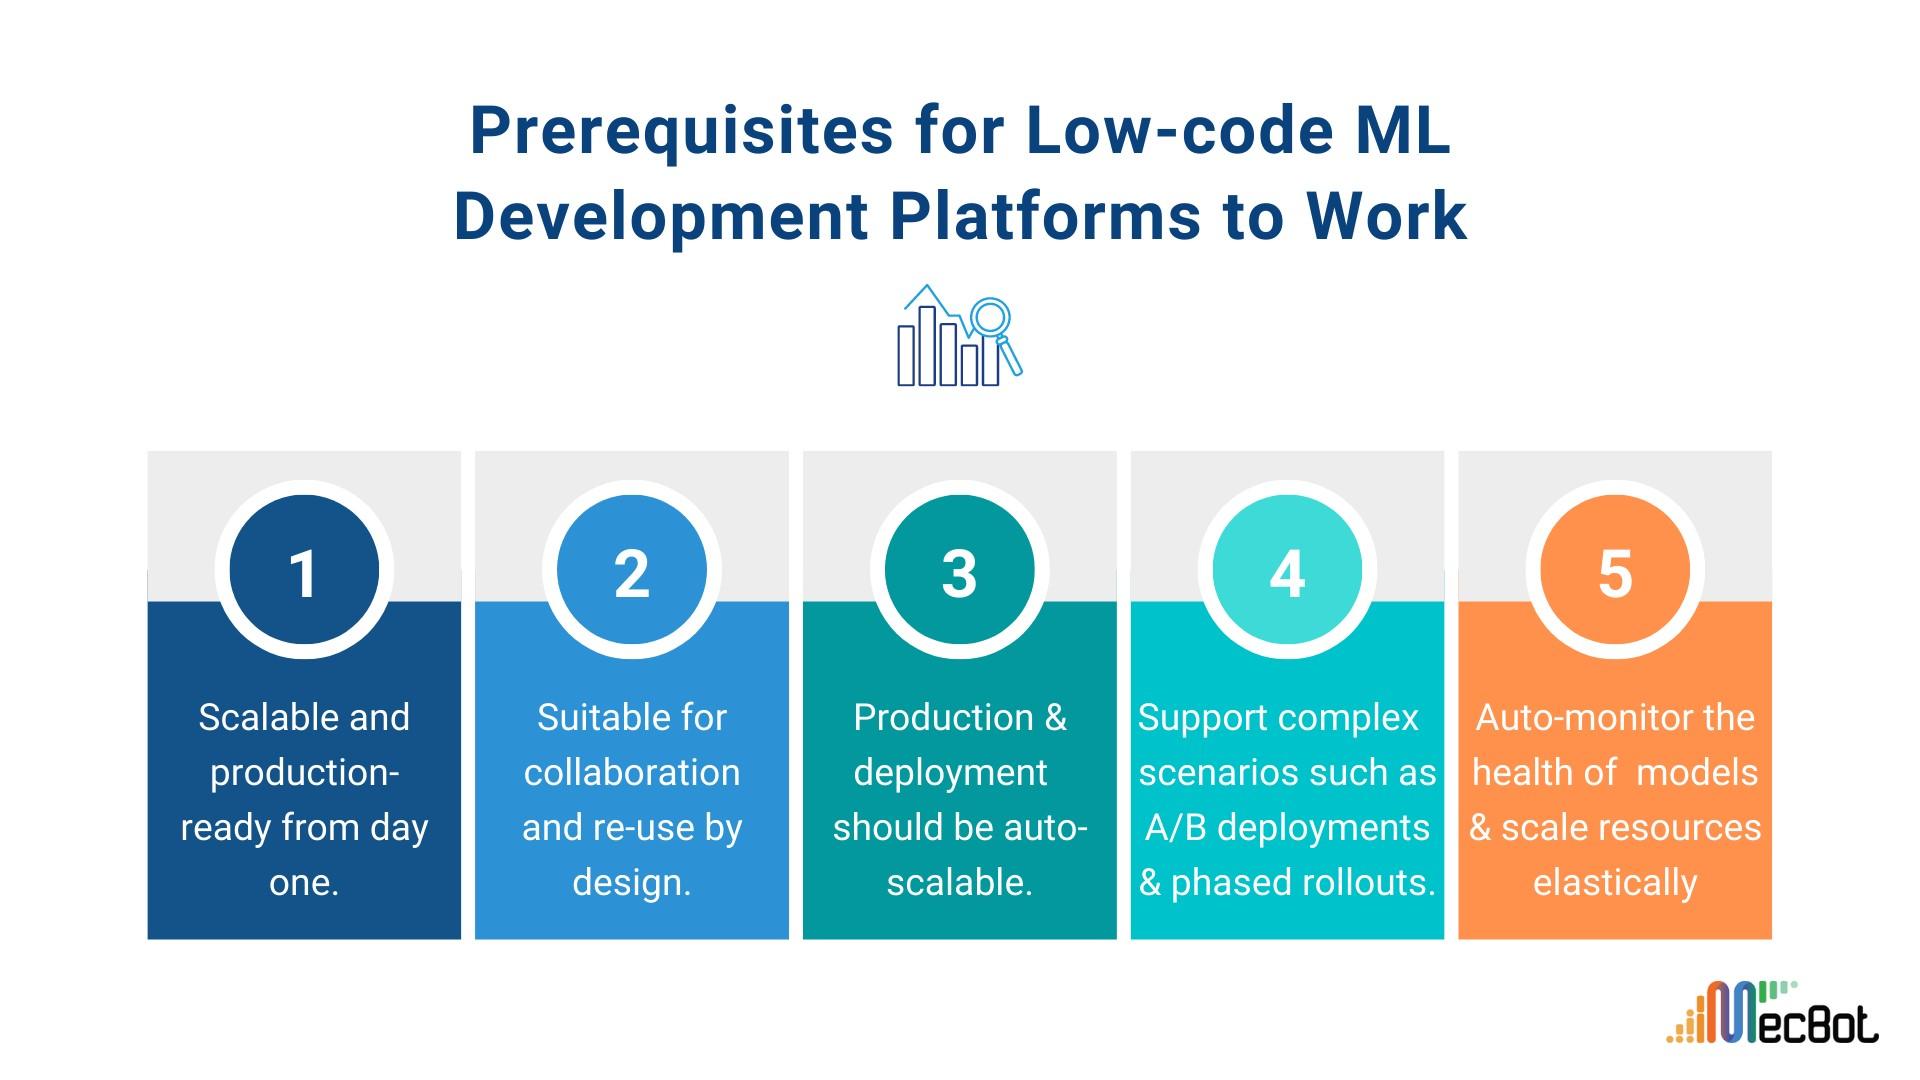 Prerequisites for Low-code ML